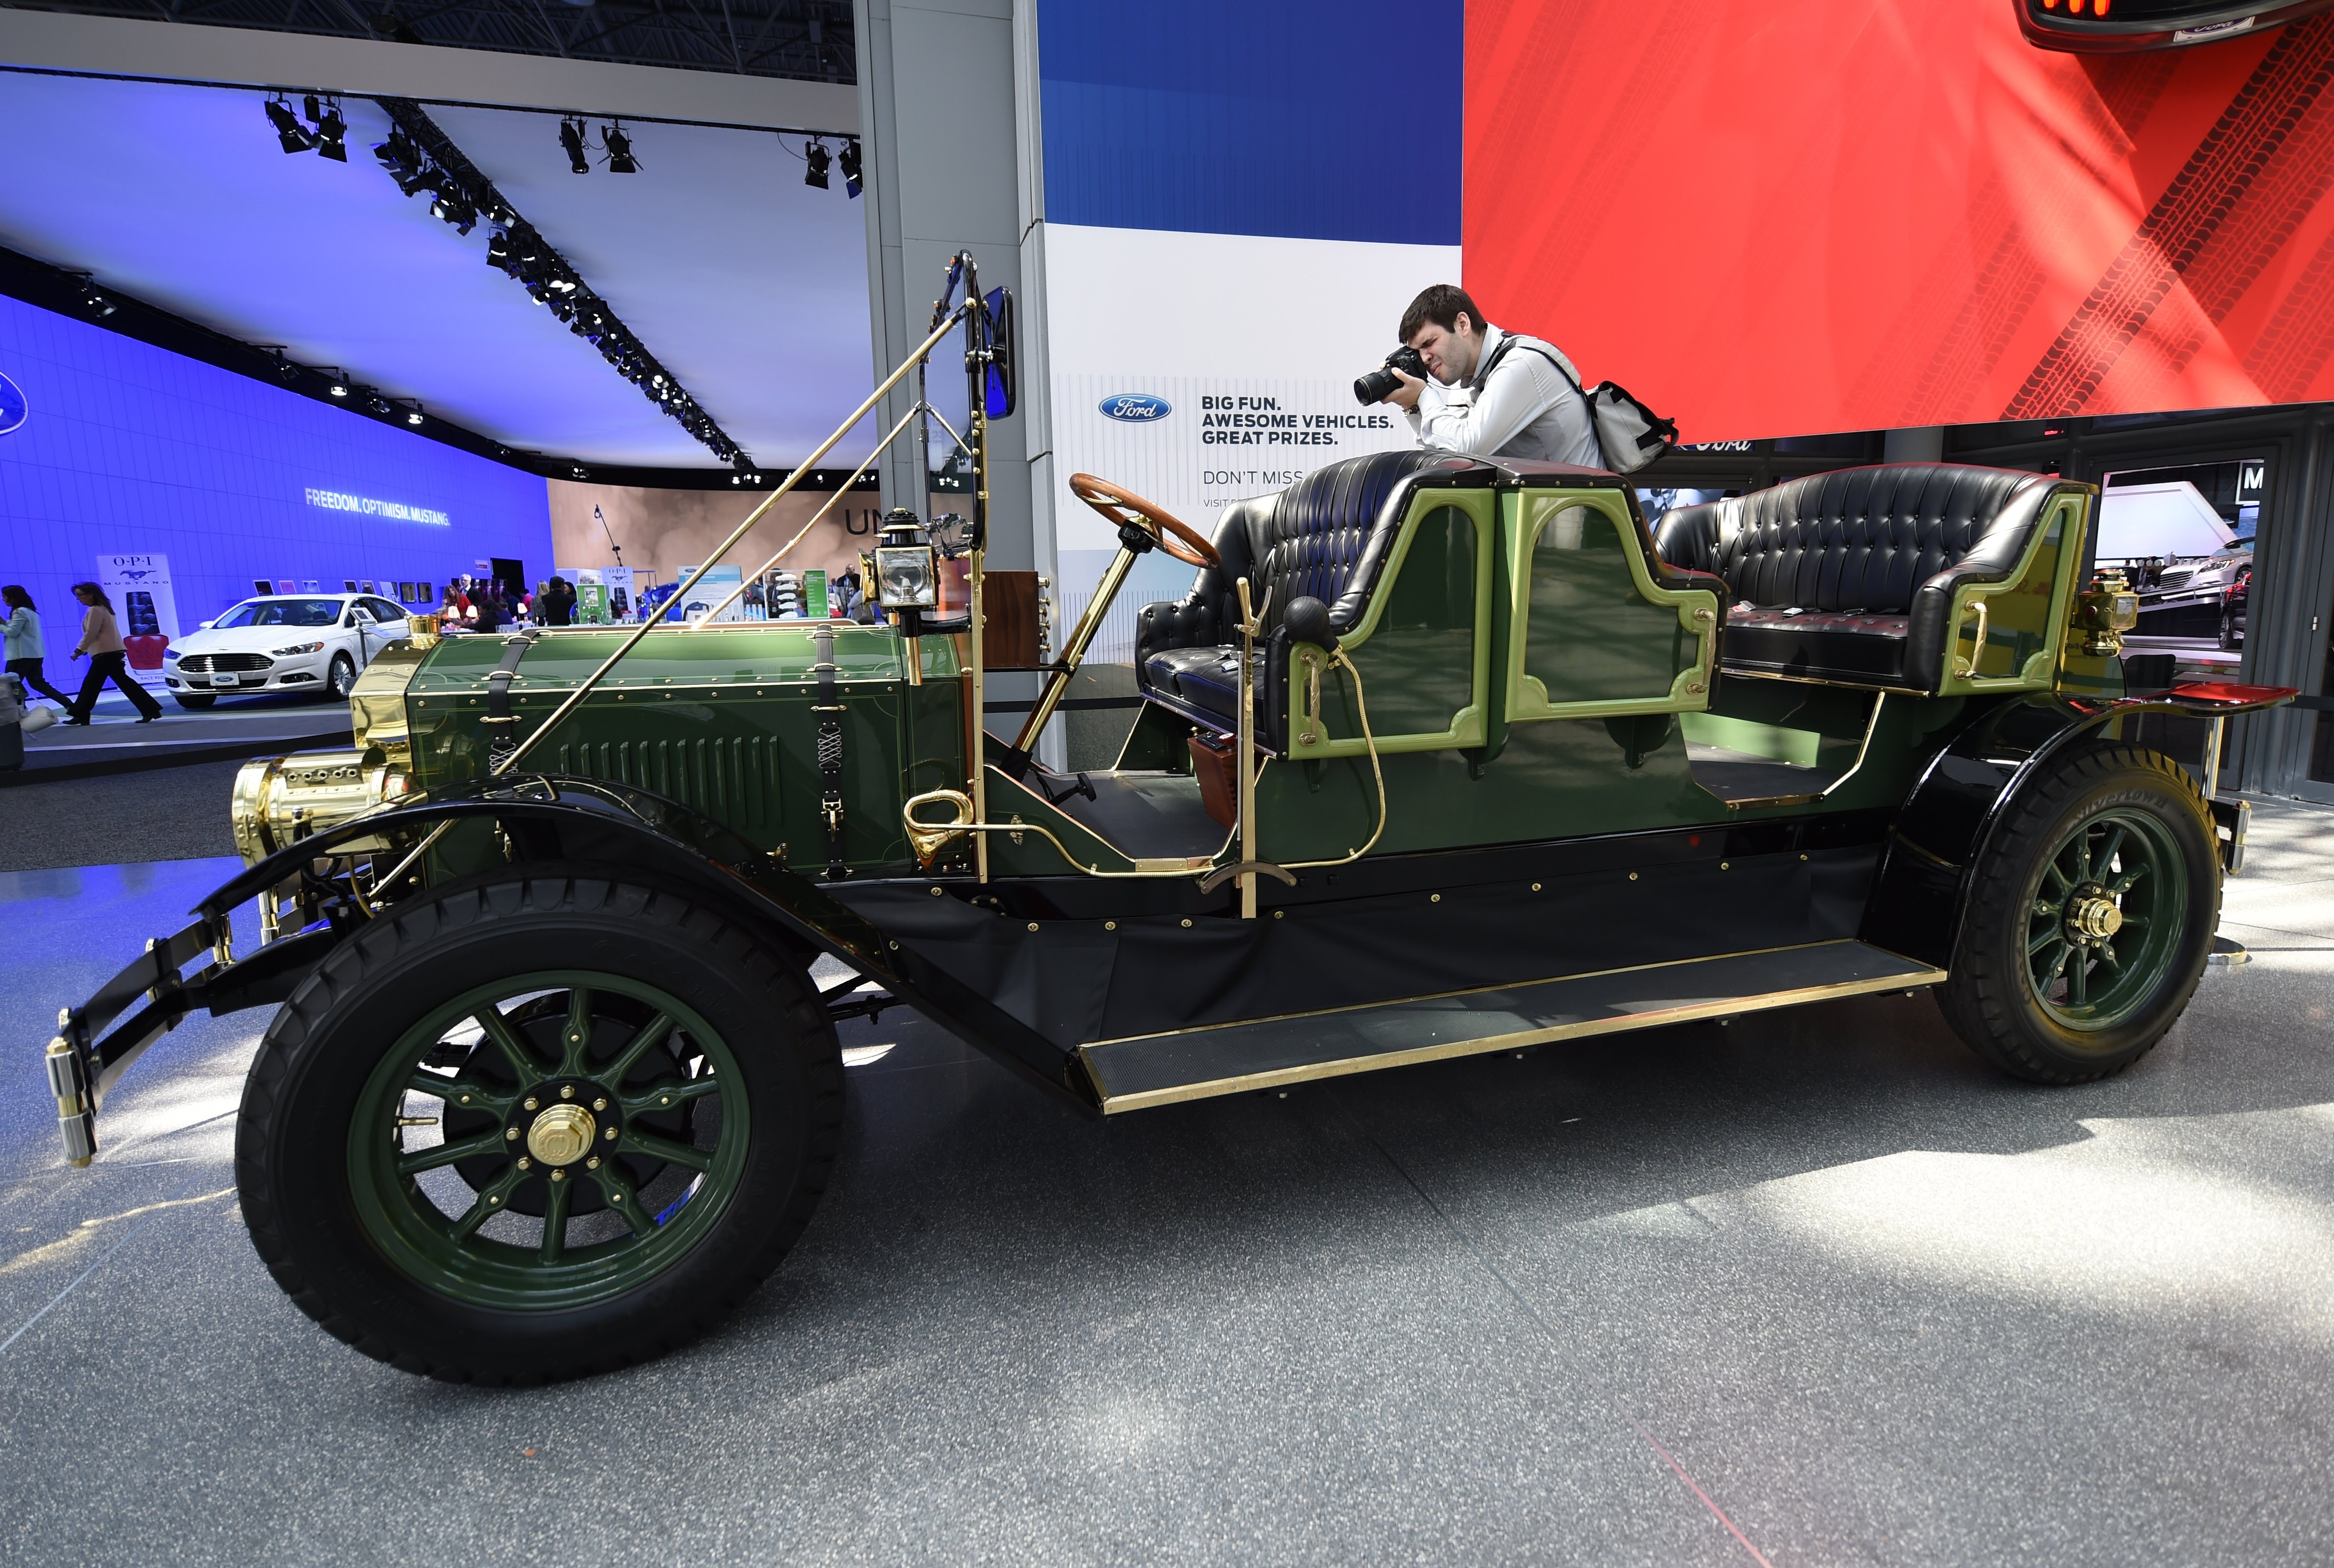 Drawn vehicle antique car  that York « To